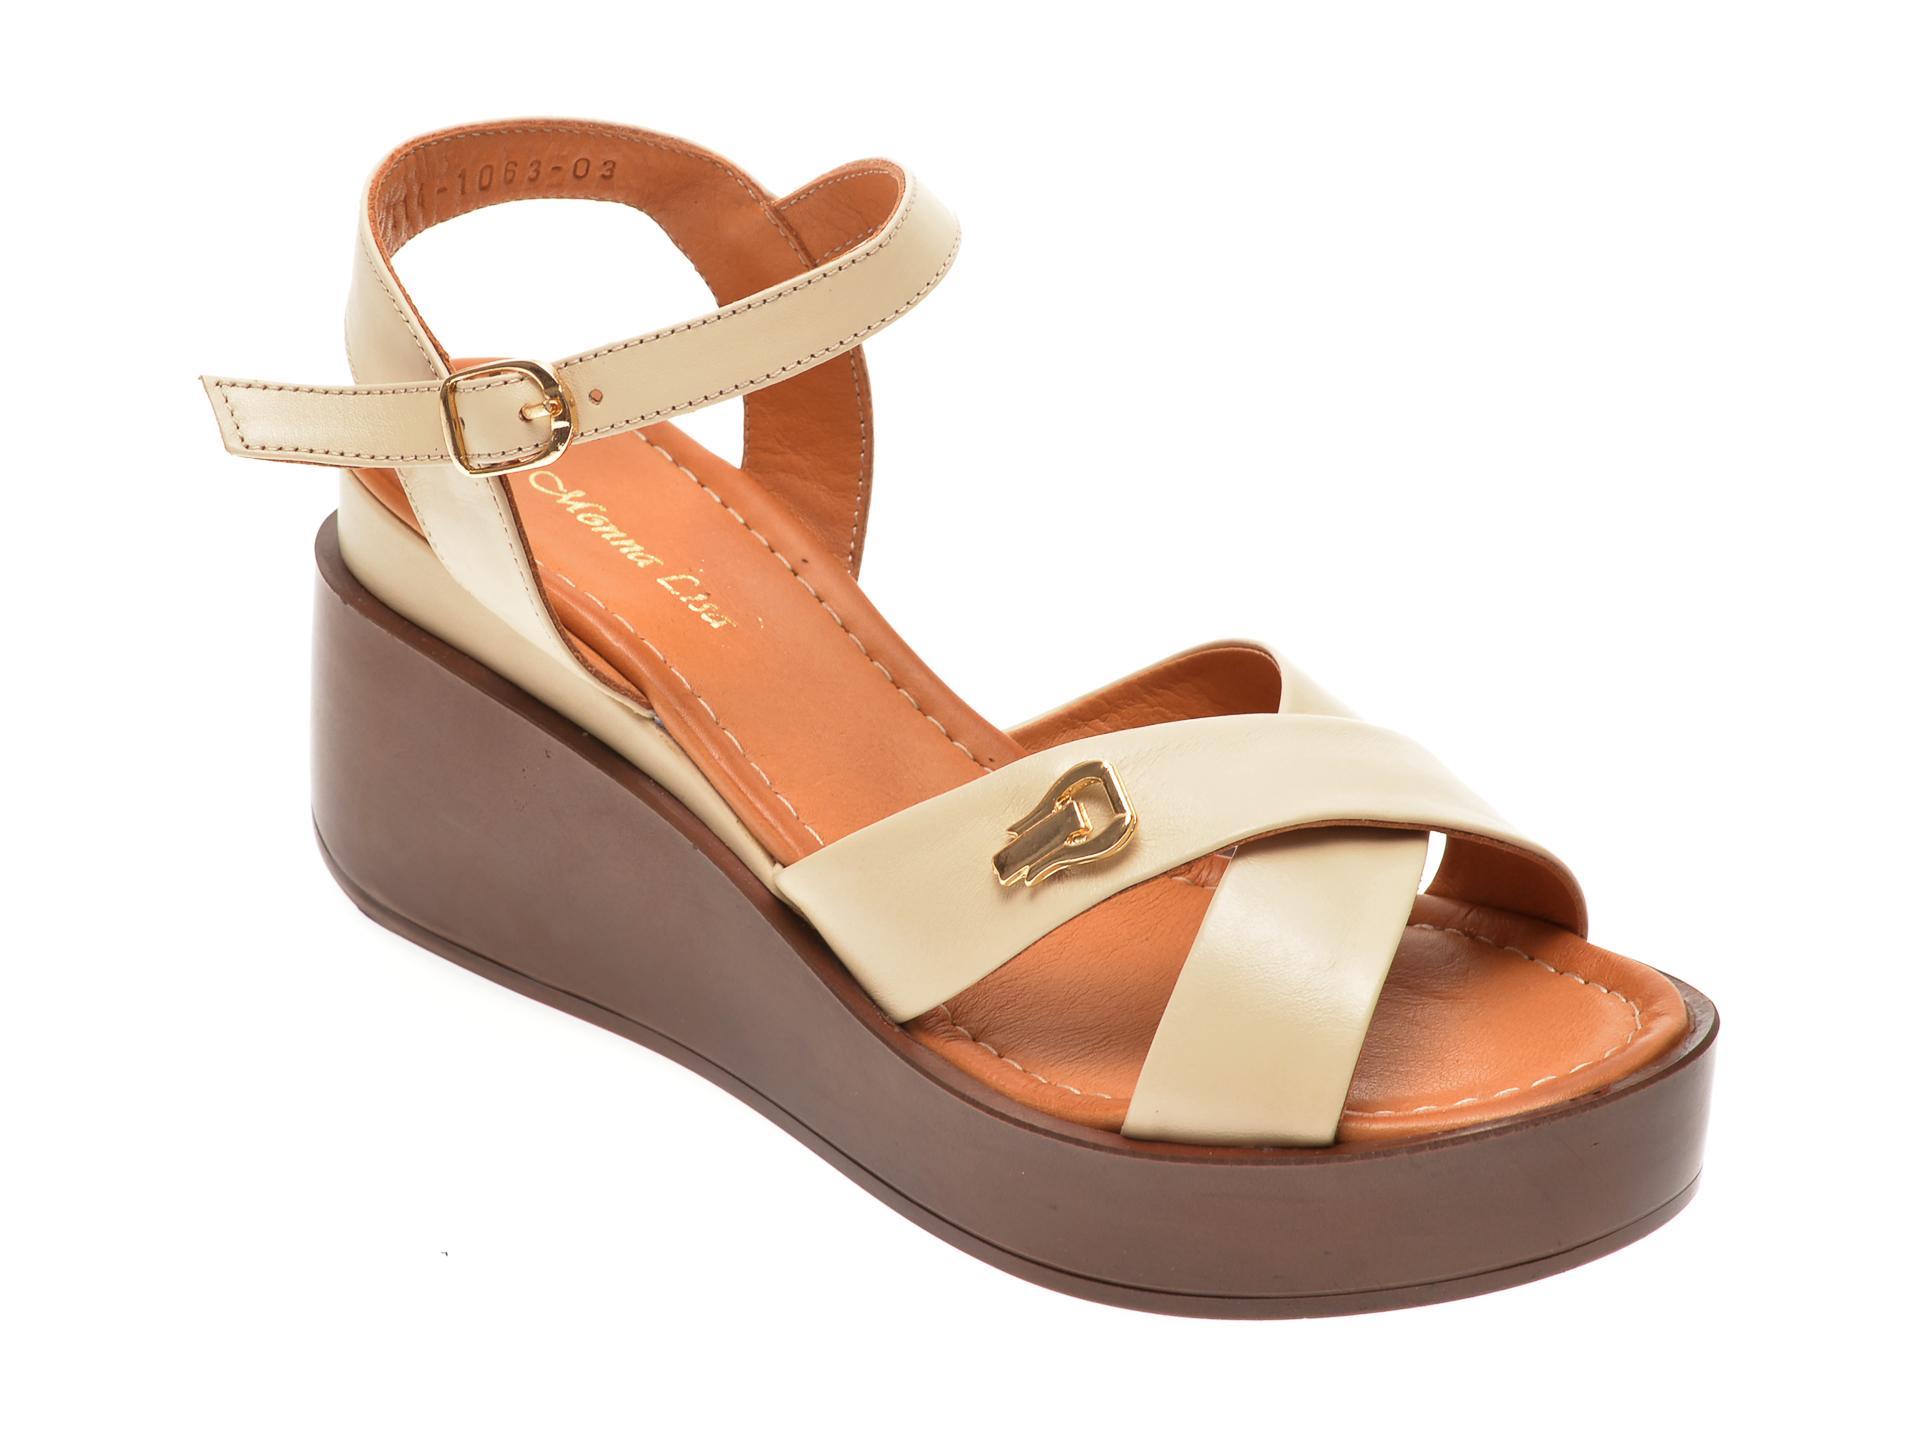 Sandale MISS LIZA bej, 1181063, din piele naturala